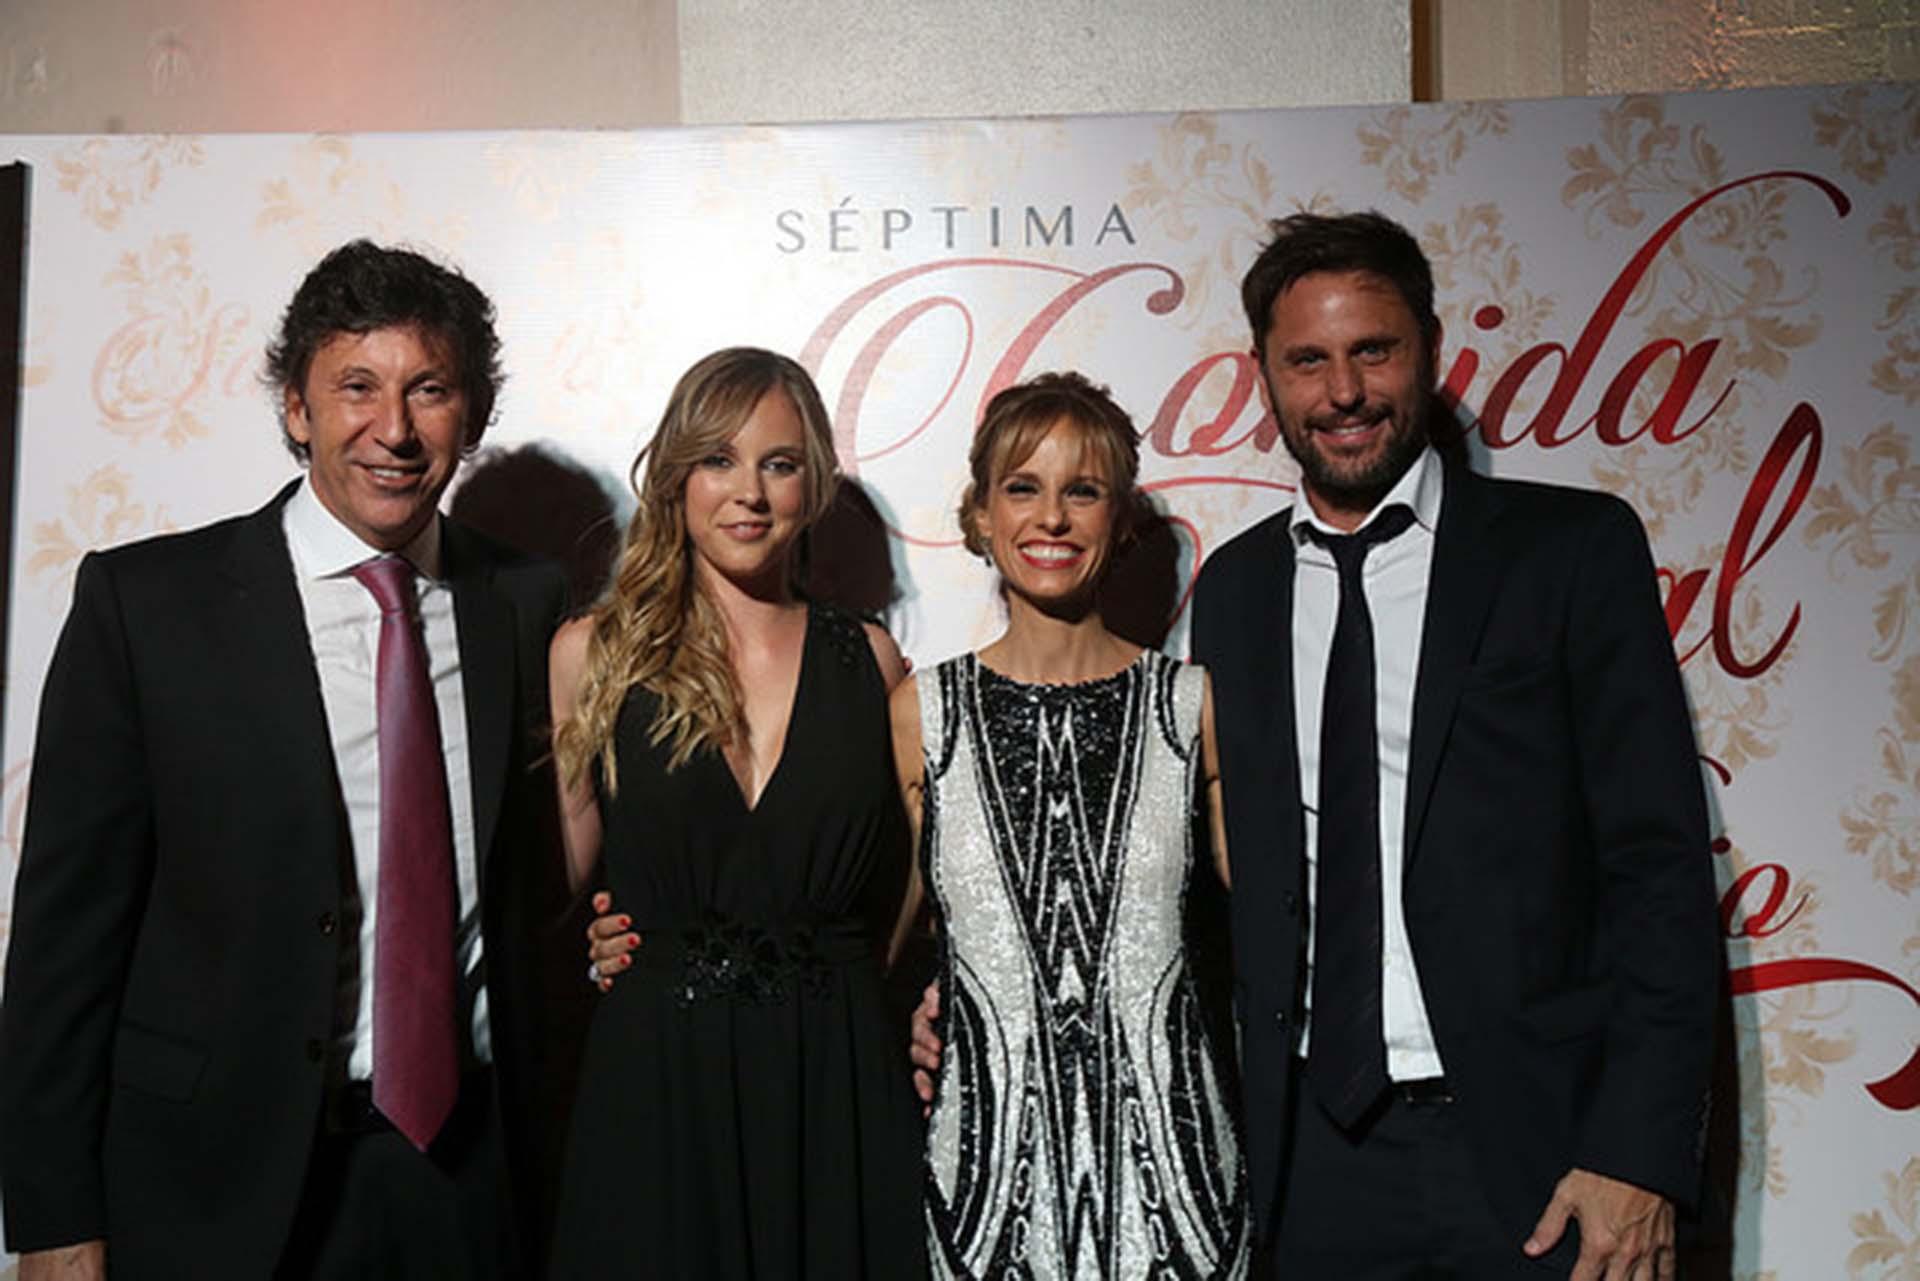 Gustavo Posse y su hija Macarena junto a Mariana Fabbiani y su marido Mariano Chihade